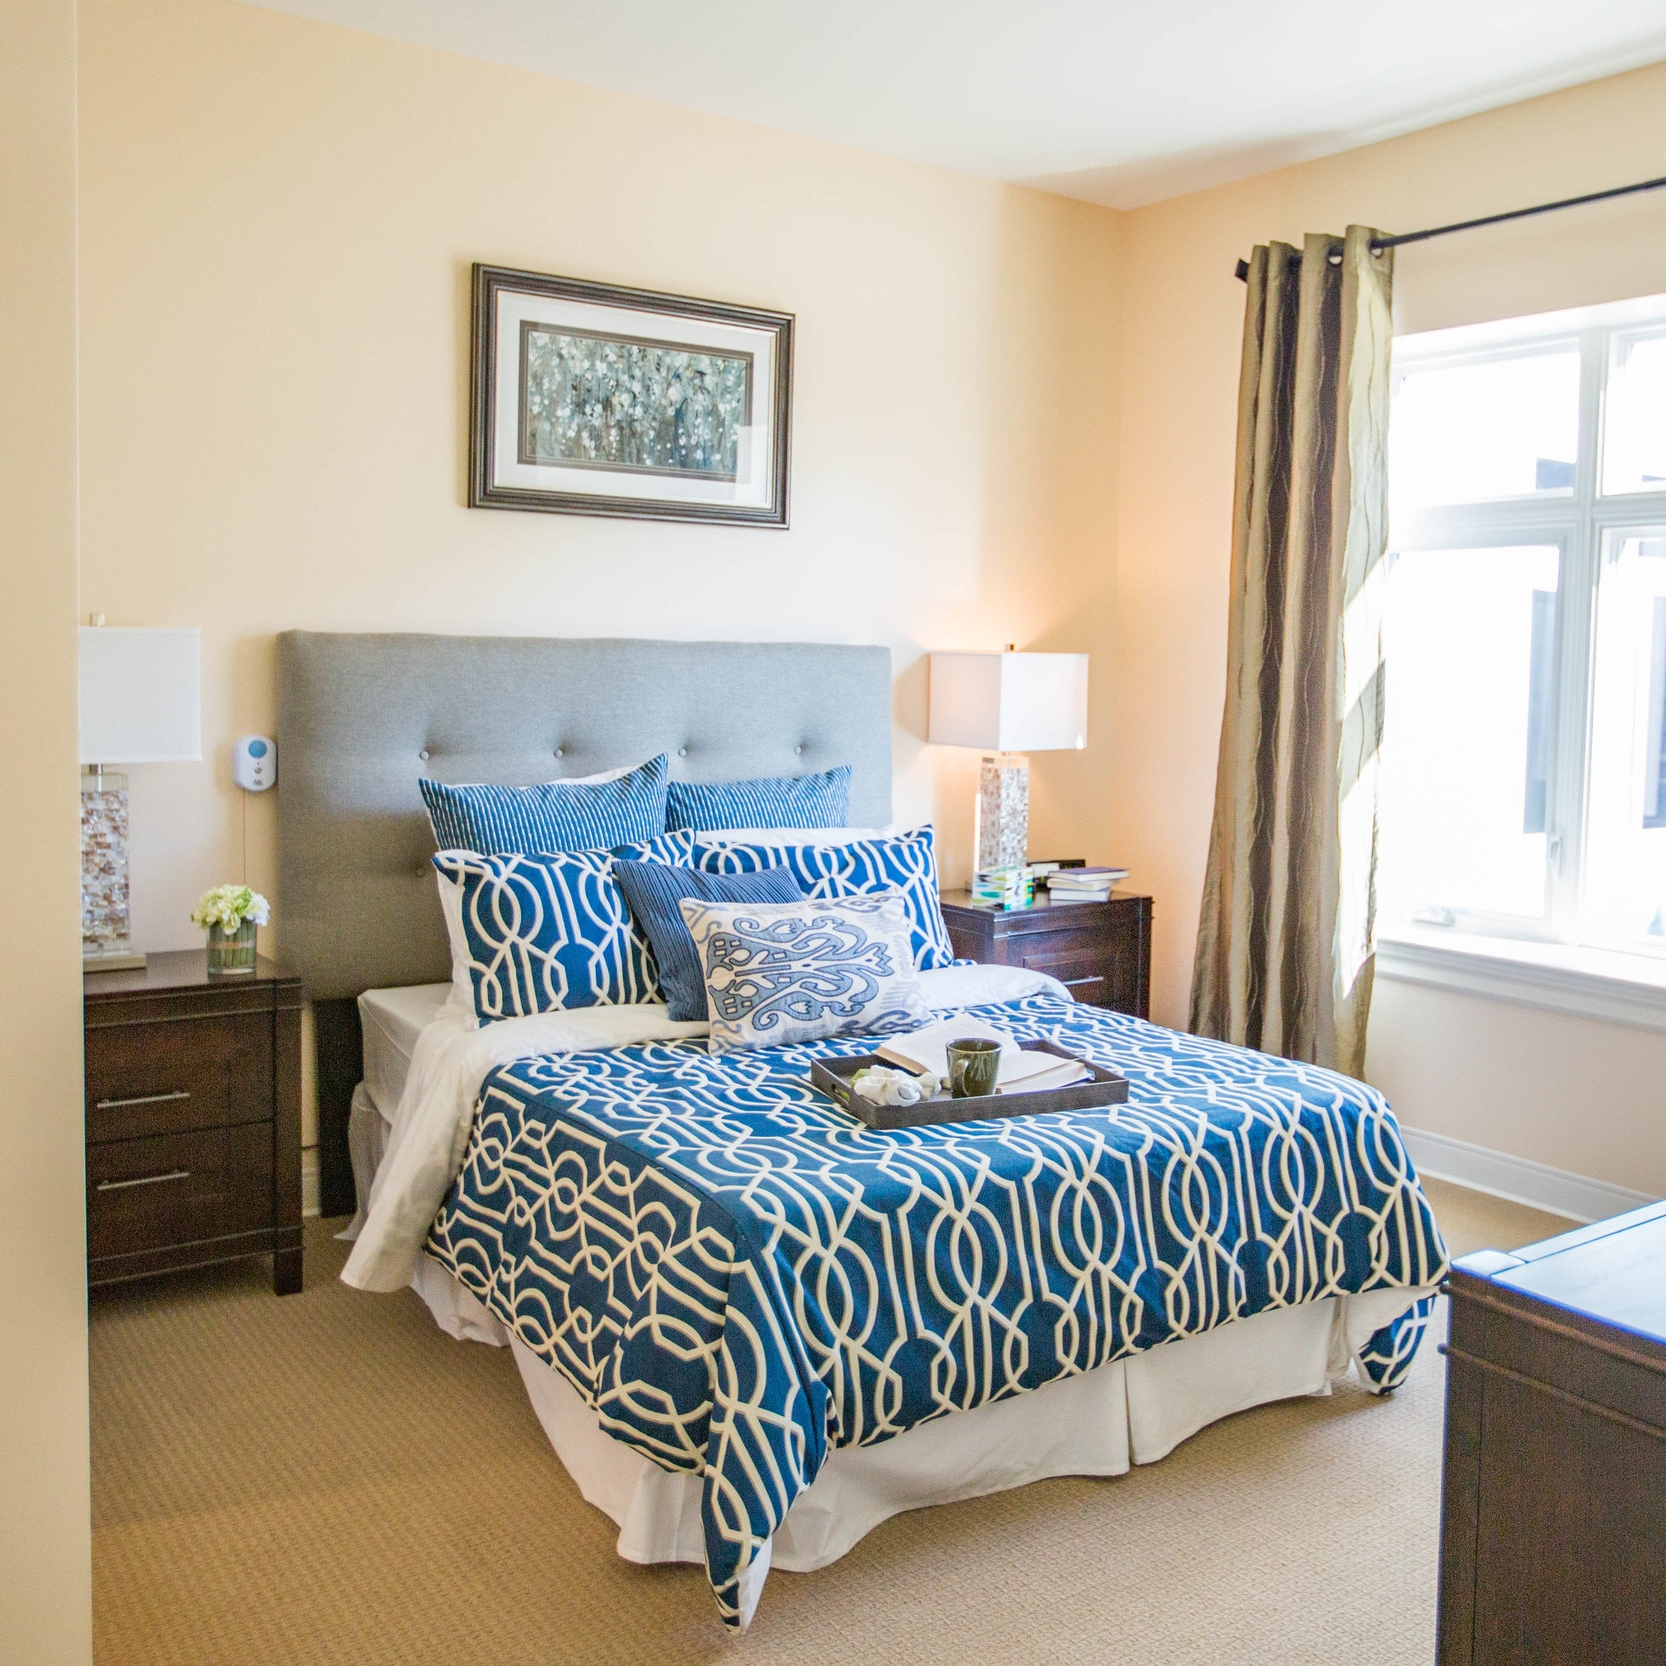 Benchmark Senior Living   79,000 Square Feet 3 Floors, 90 Units Norwood, Massachusetts Contractor: Callahan